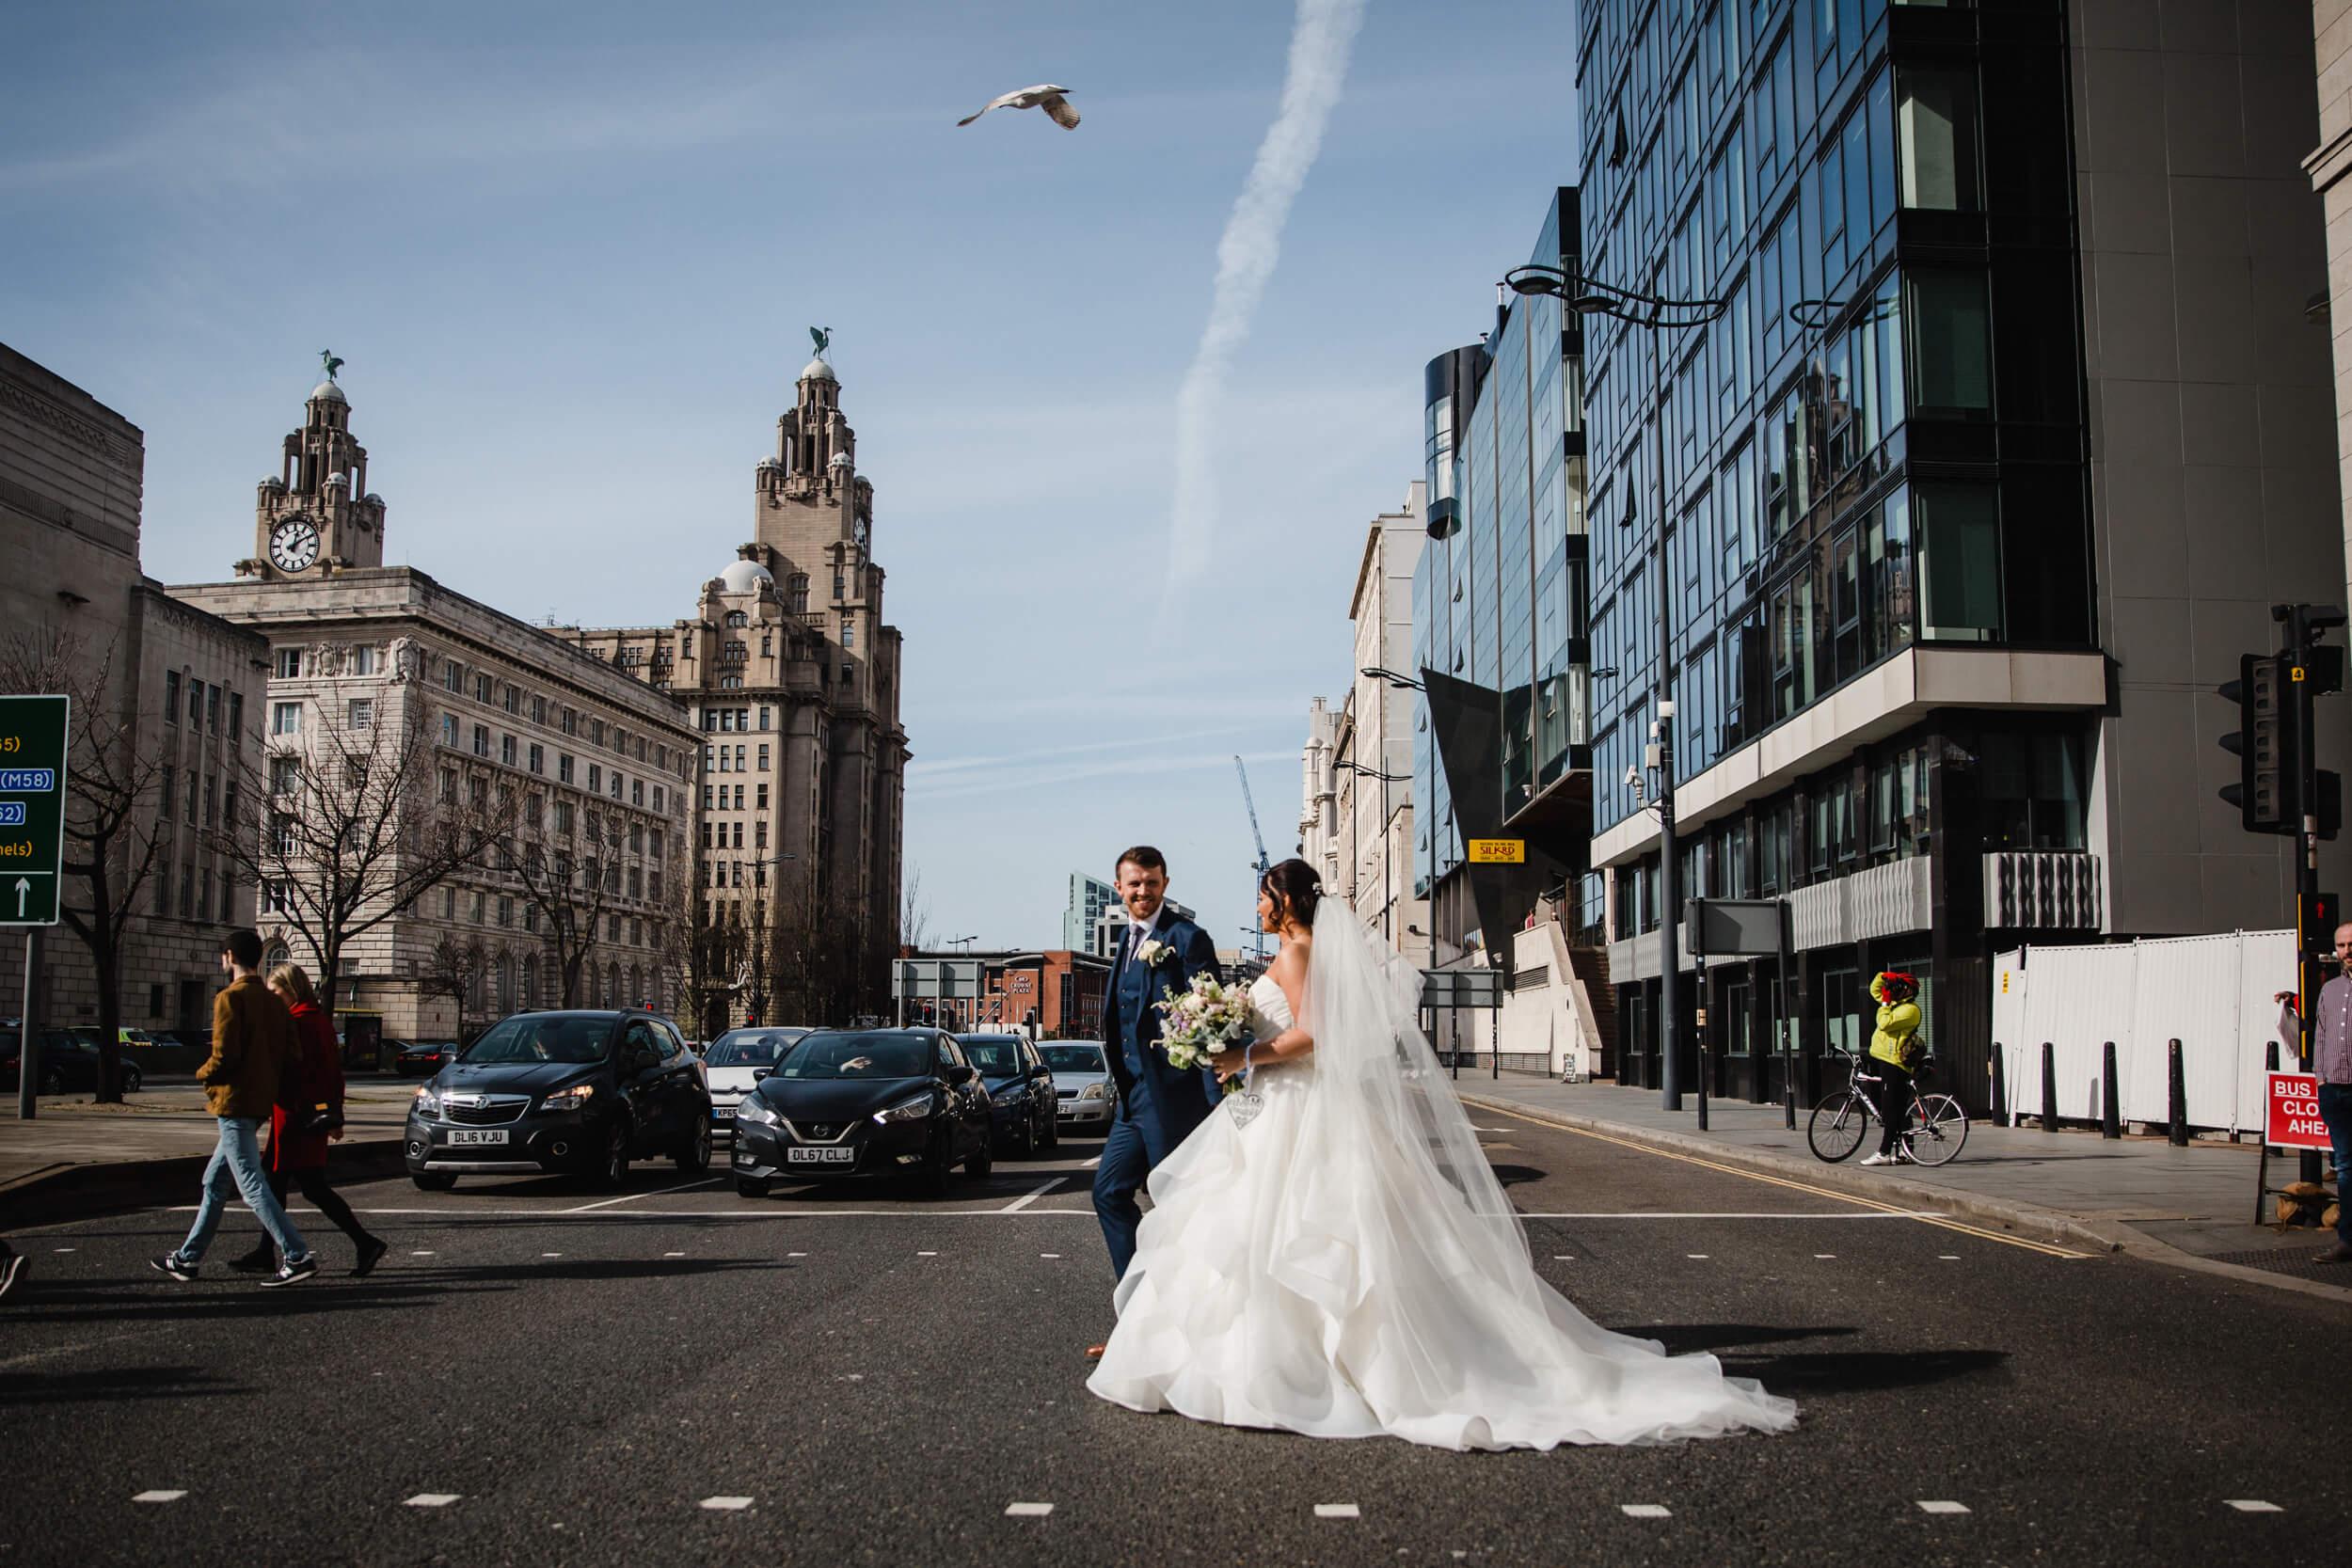 30_James_Street_Hotel_Wedding_Venue_030.jpg